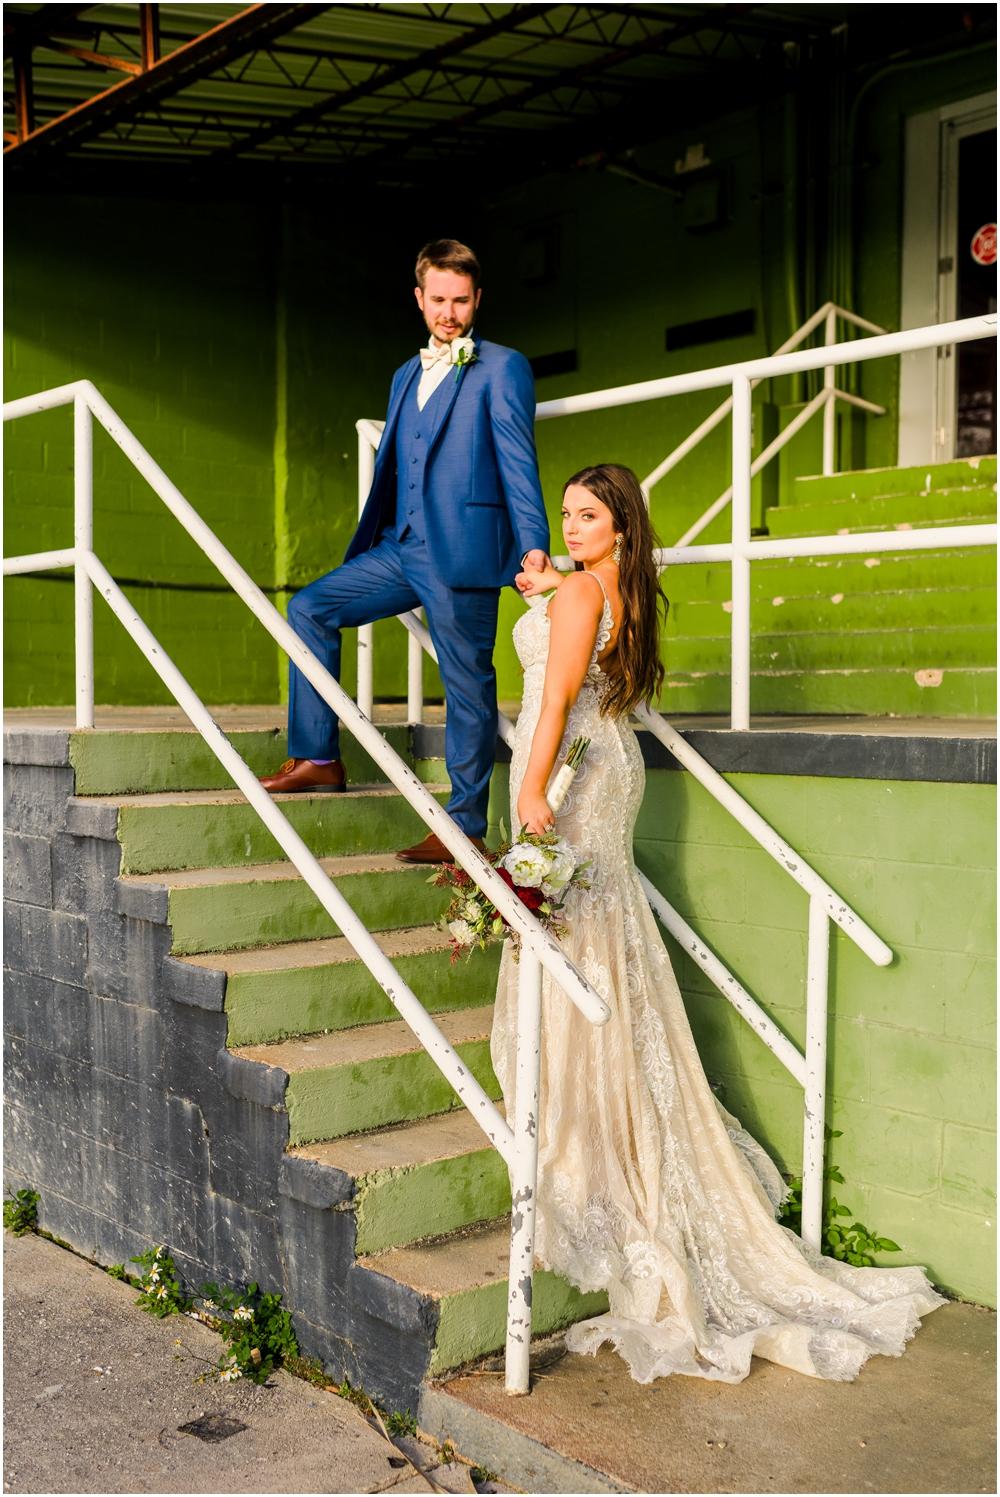 martin-wedding-panama-city-beach-florida-kiersten-stevenson-photography-91.jpg